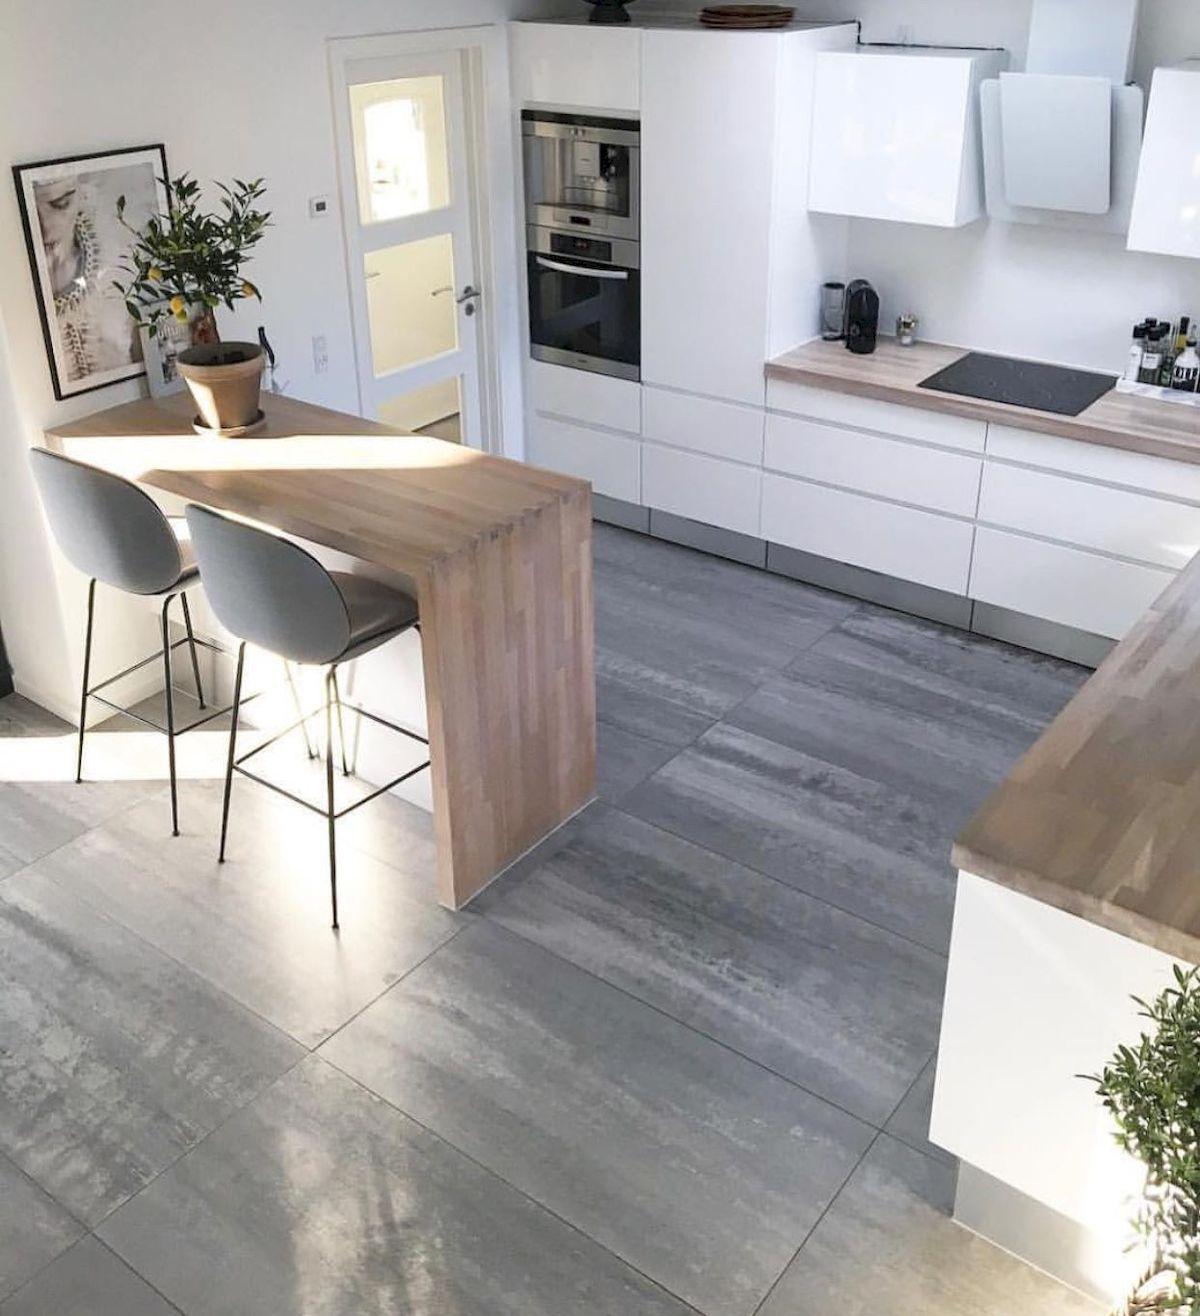 Cool Kitchen Floor Ideashttps//jihanshanum.com/kitchen floor ...